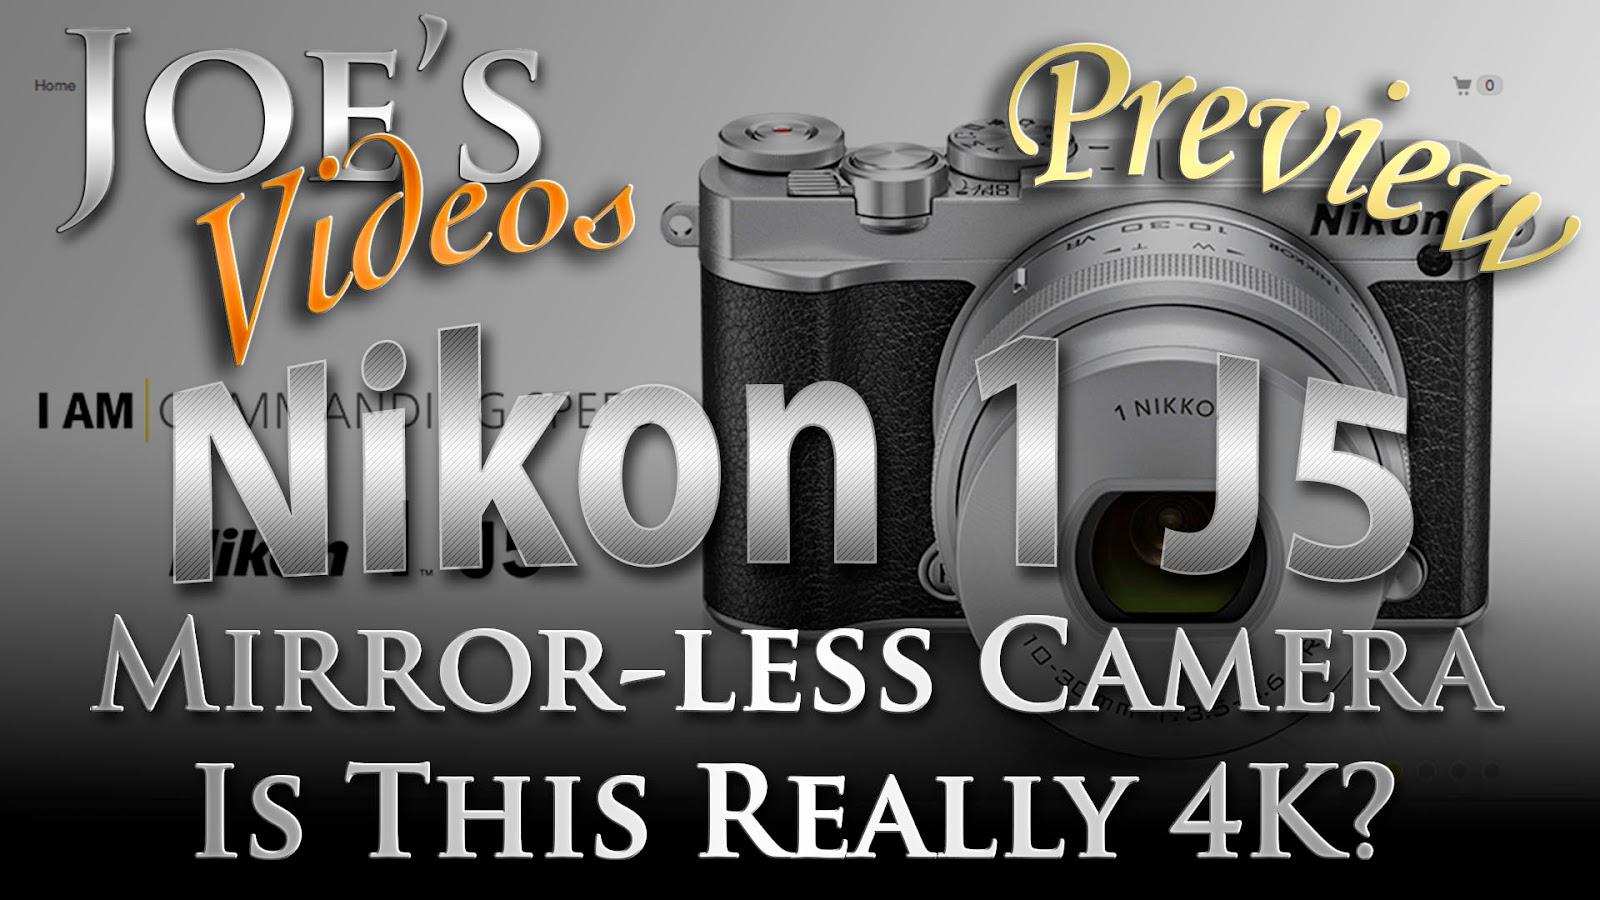 Nikon 1 J5 Mirror-less Camera Preview, Is This Really 4K?  | Joe's Videos